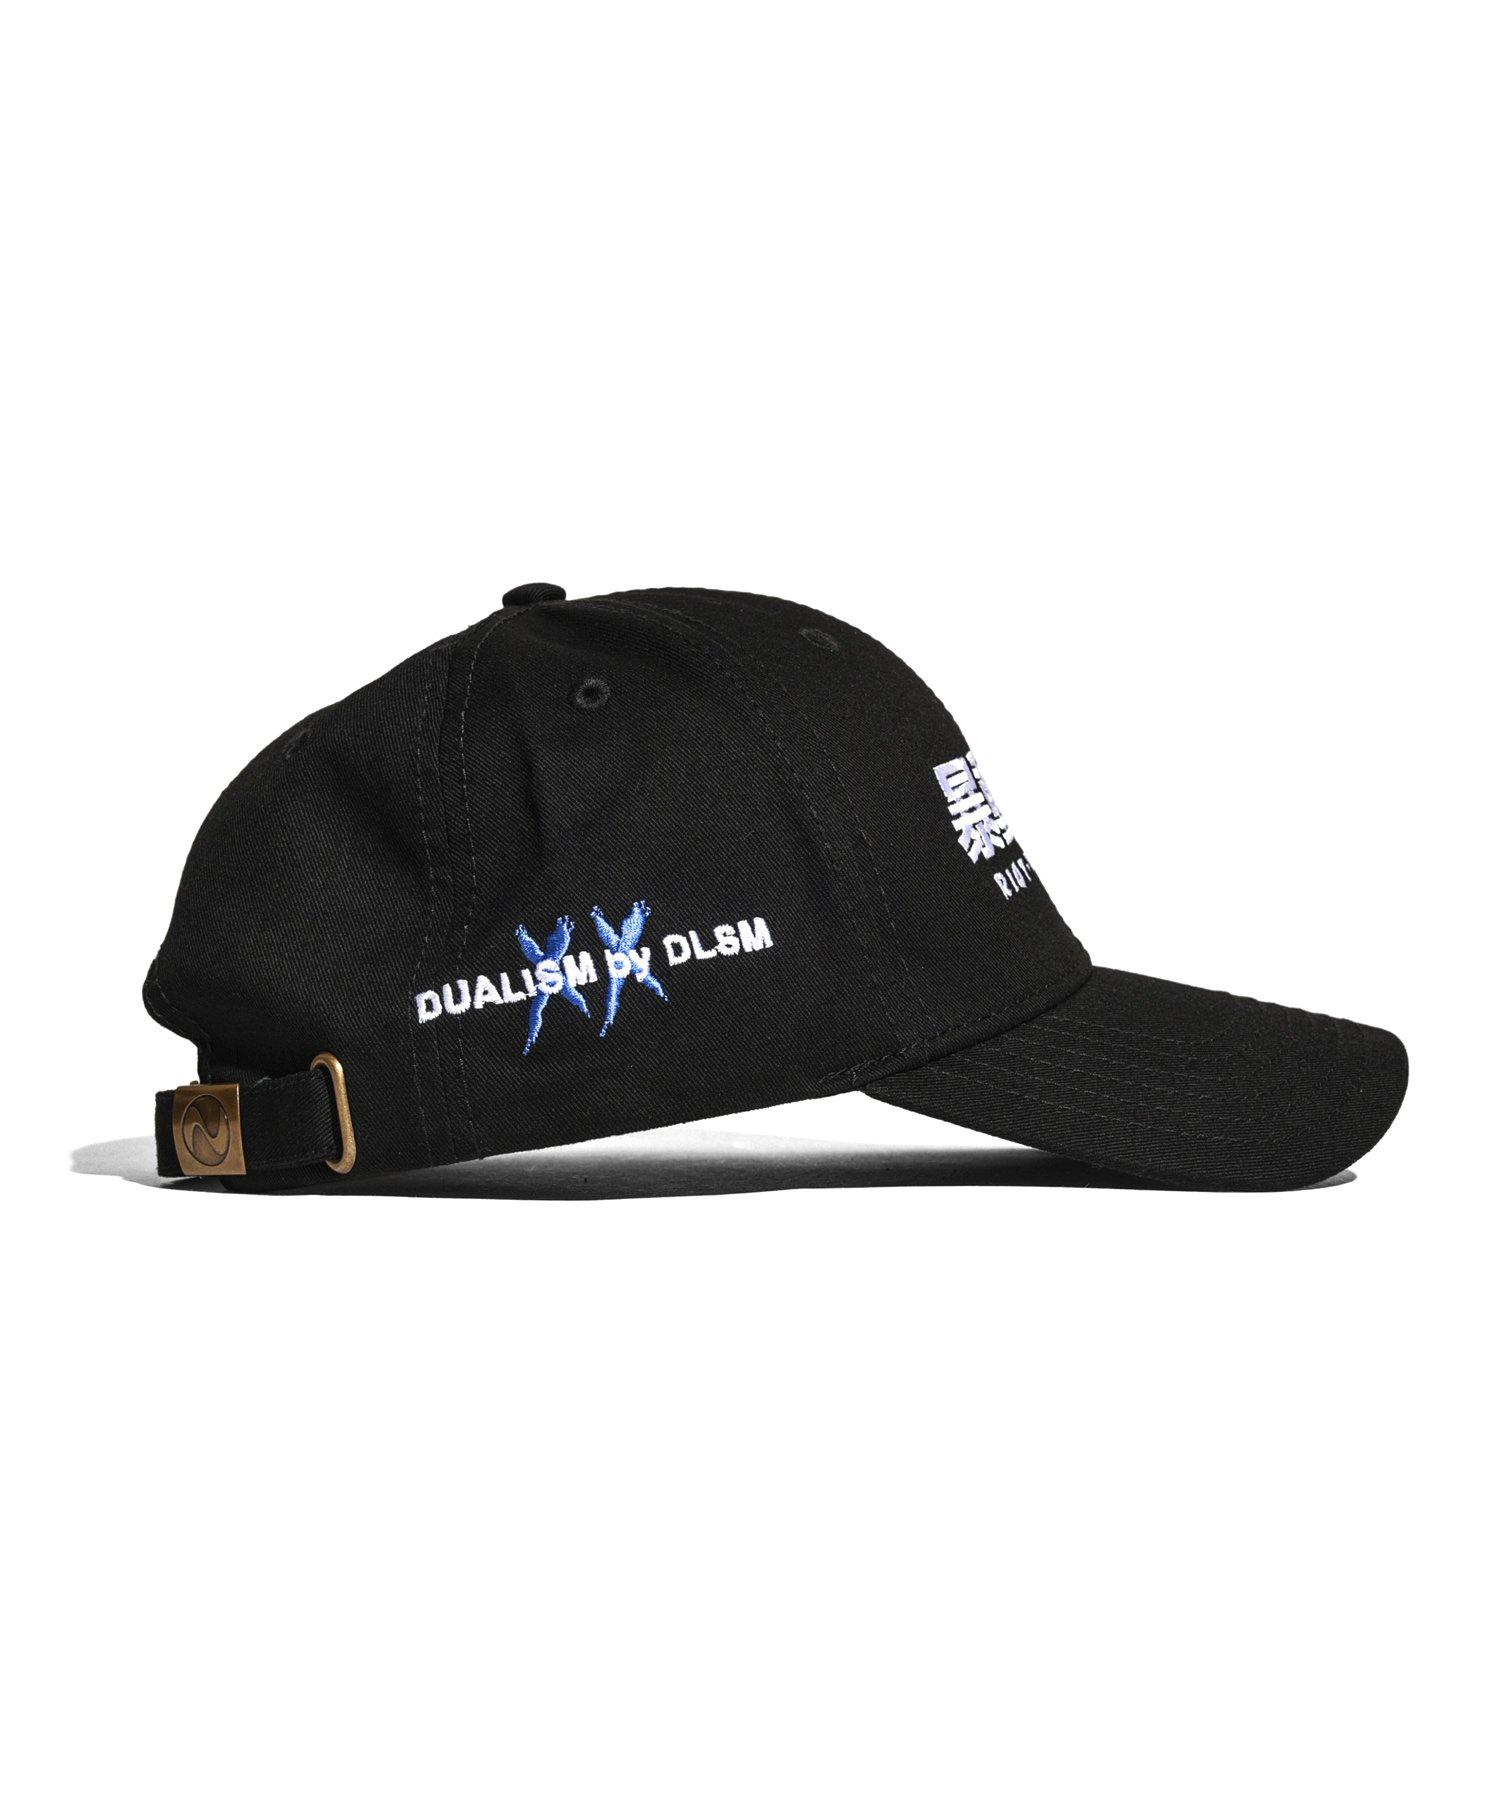 DLSM 暴動天国 CAP<ステッカー付き>